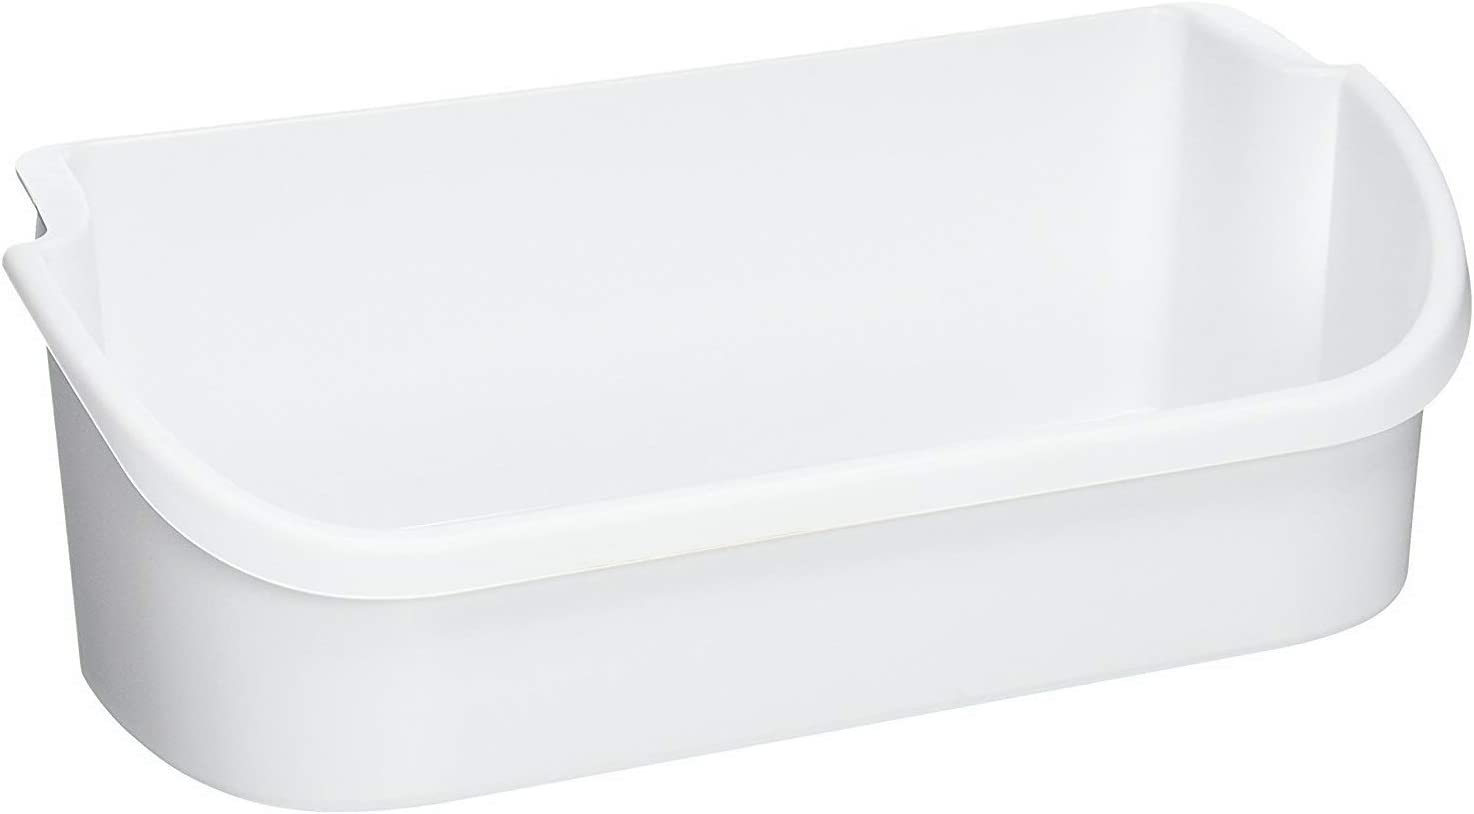 240363701 Door Bin for Refrigerato by Romalon